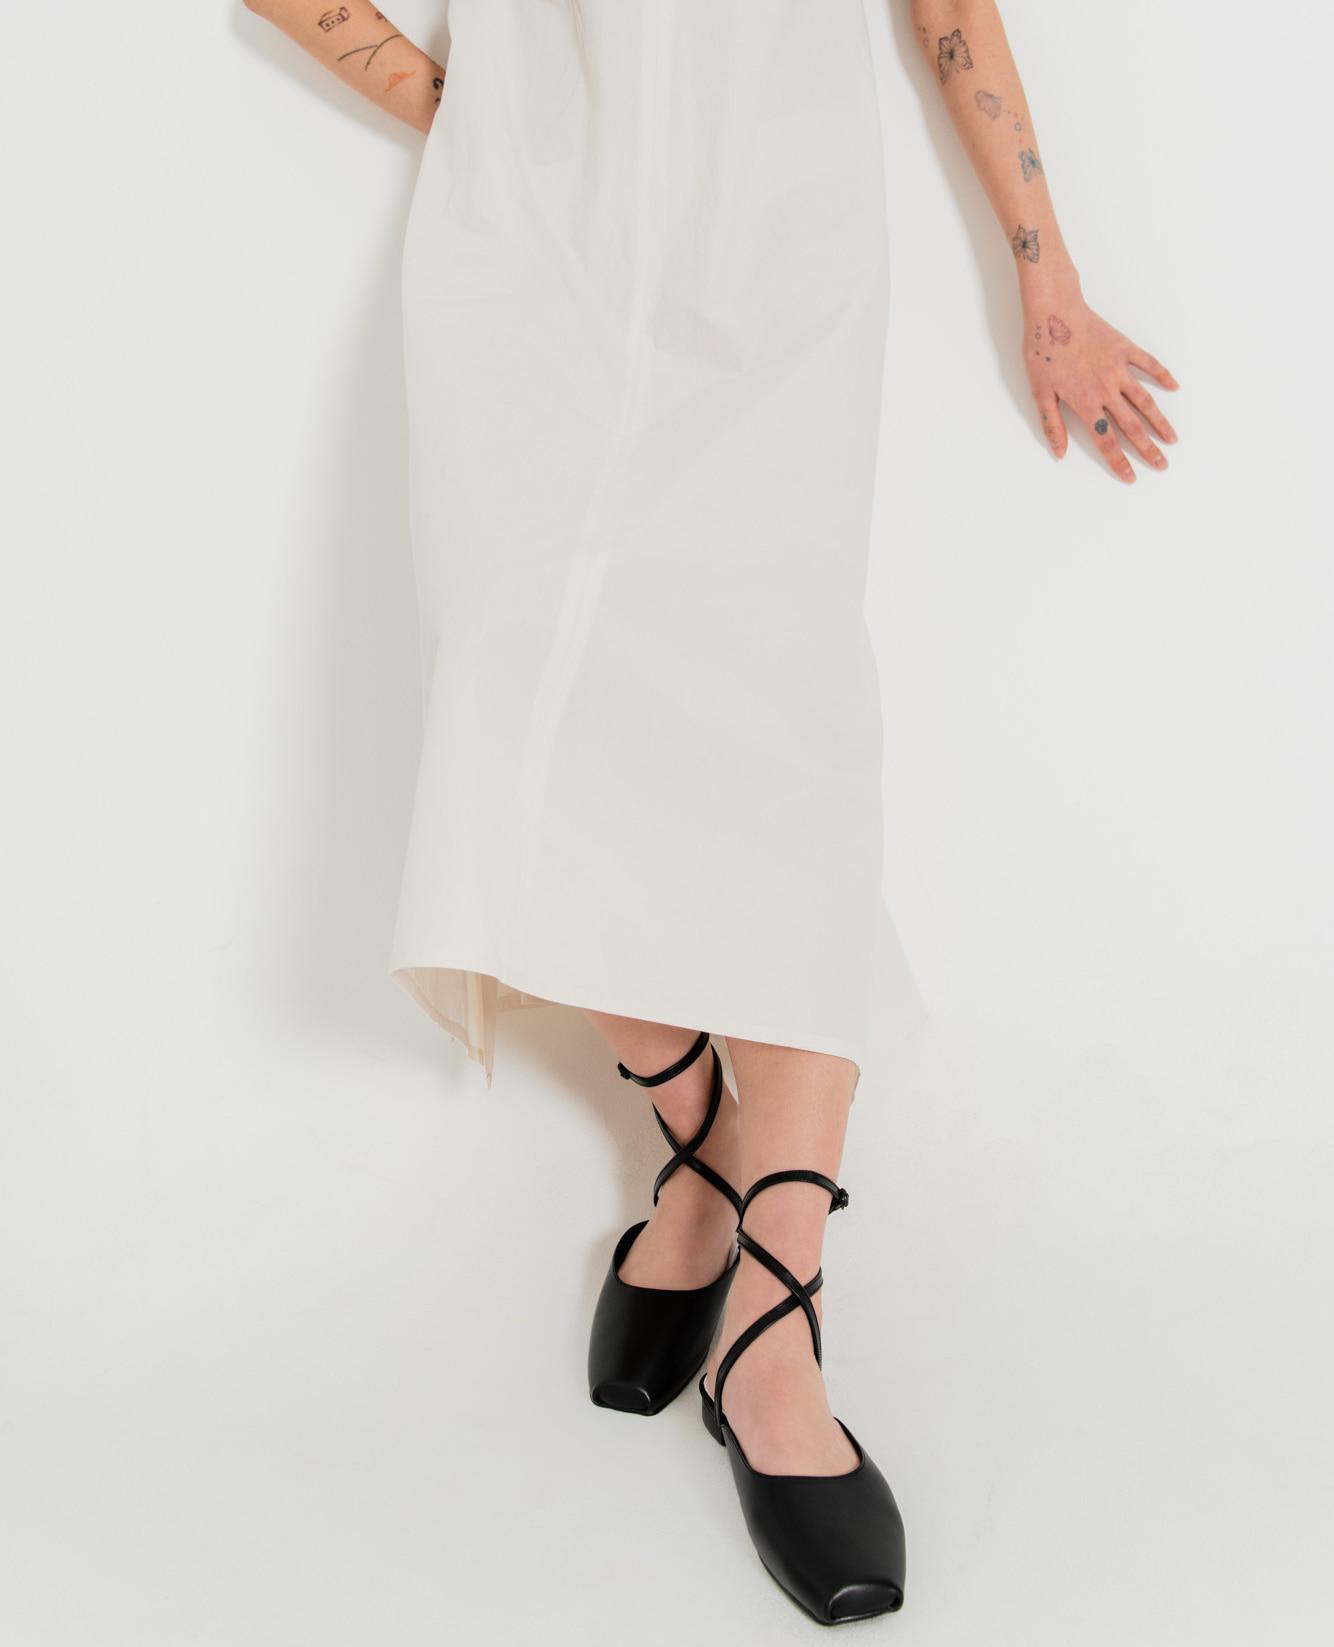 Ballet Toe Ankle Strap Flats | Black